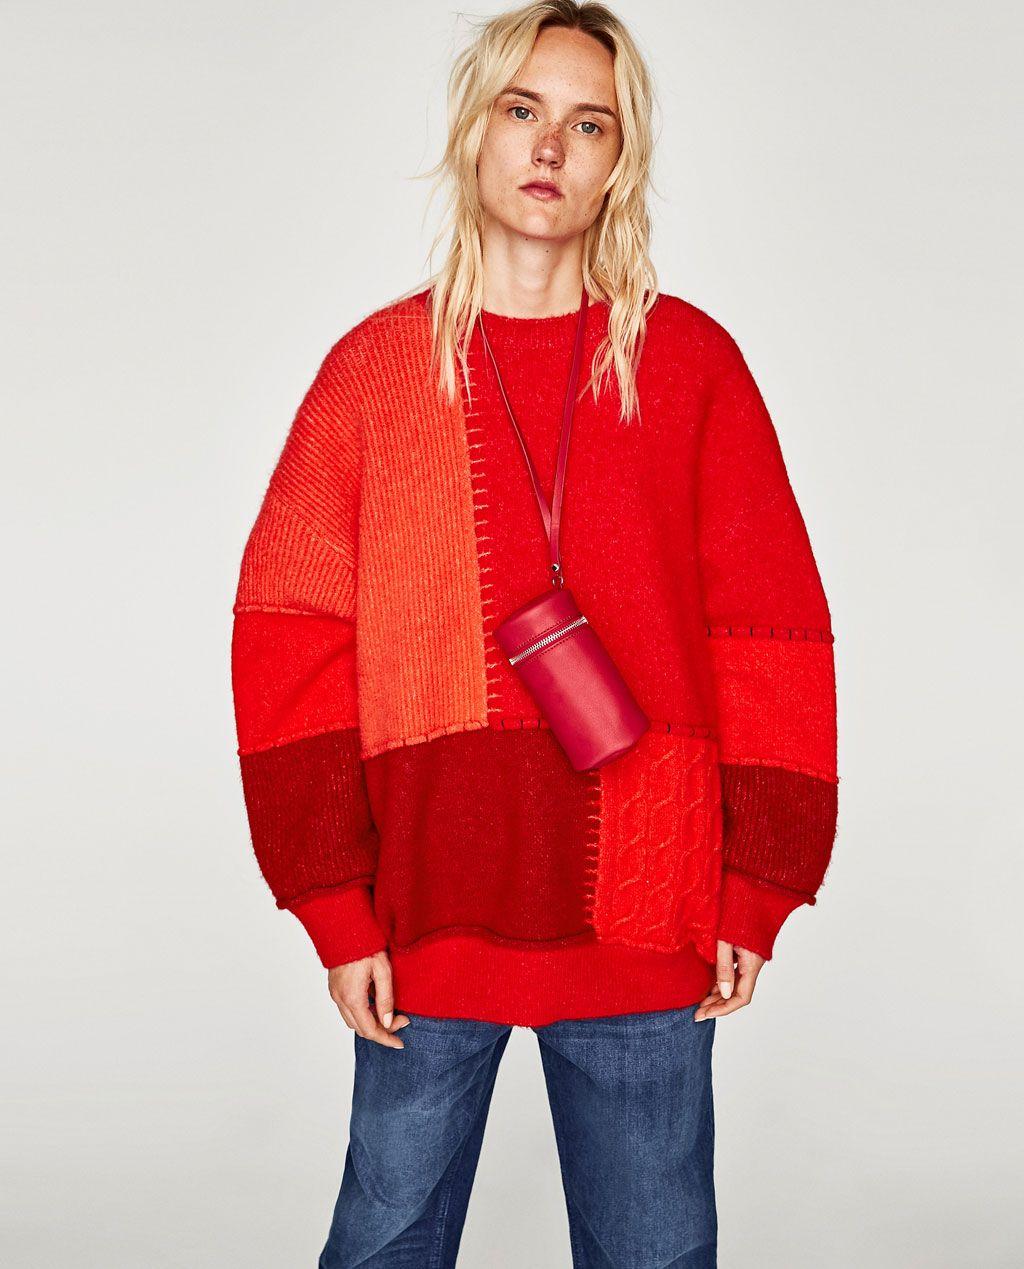 Imagen 4 de JERSEY PATCHWORK de Zara | /moda/models/make ...